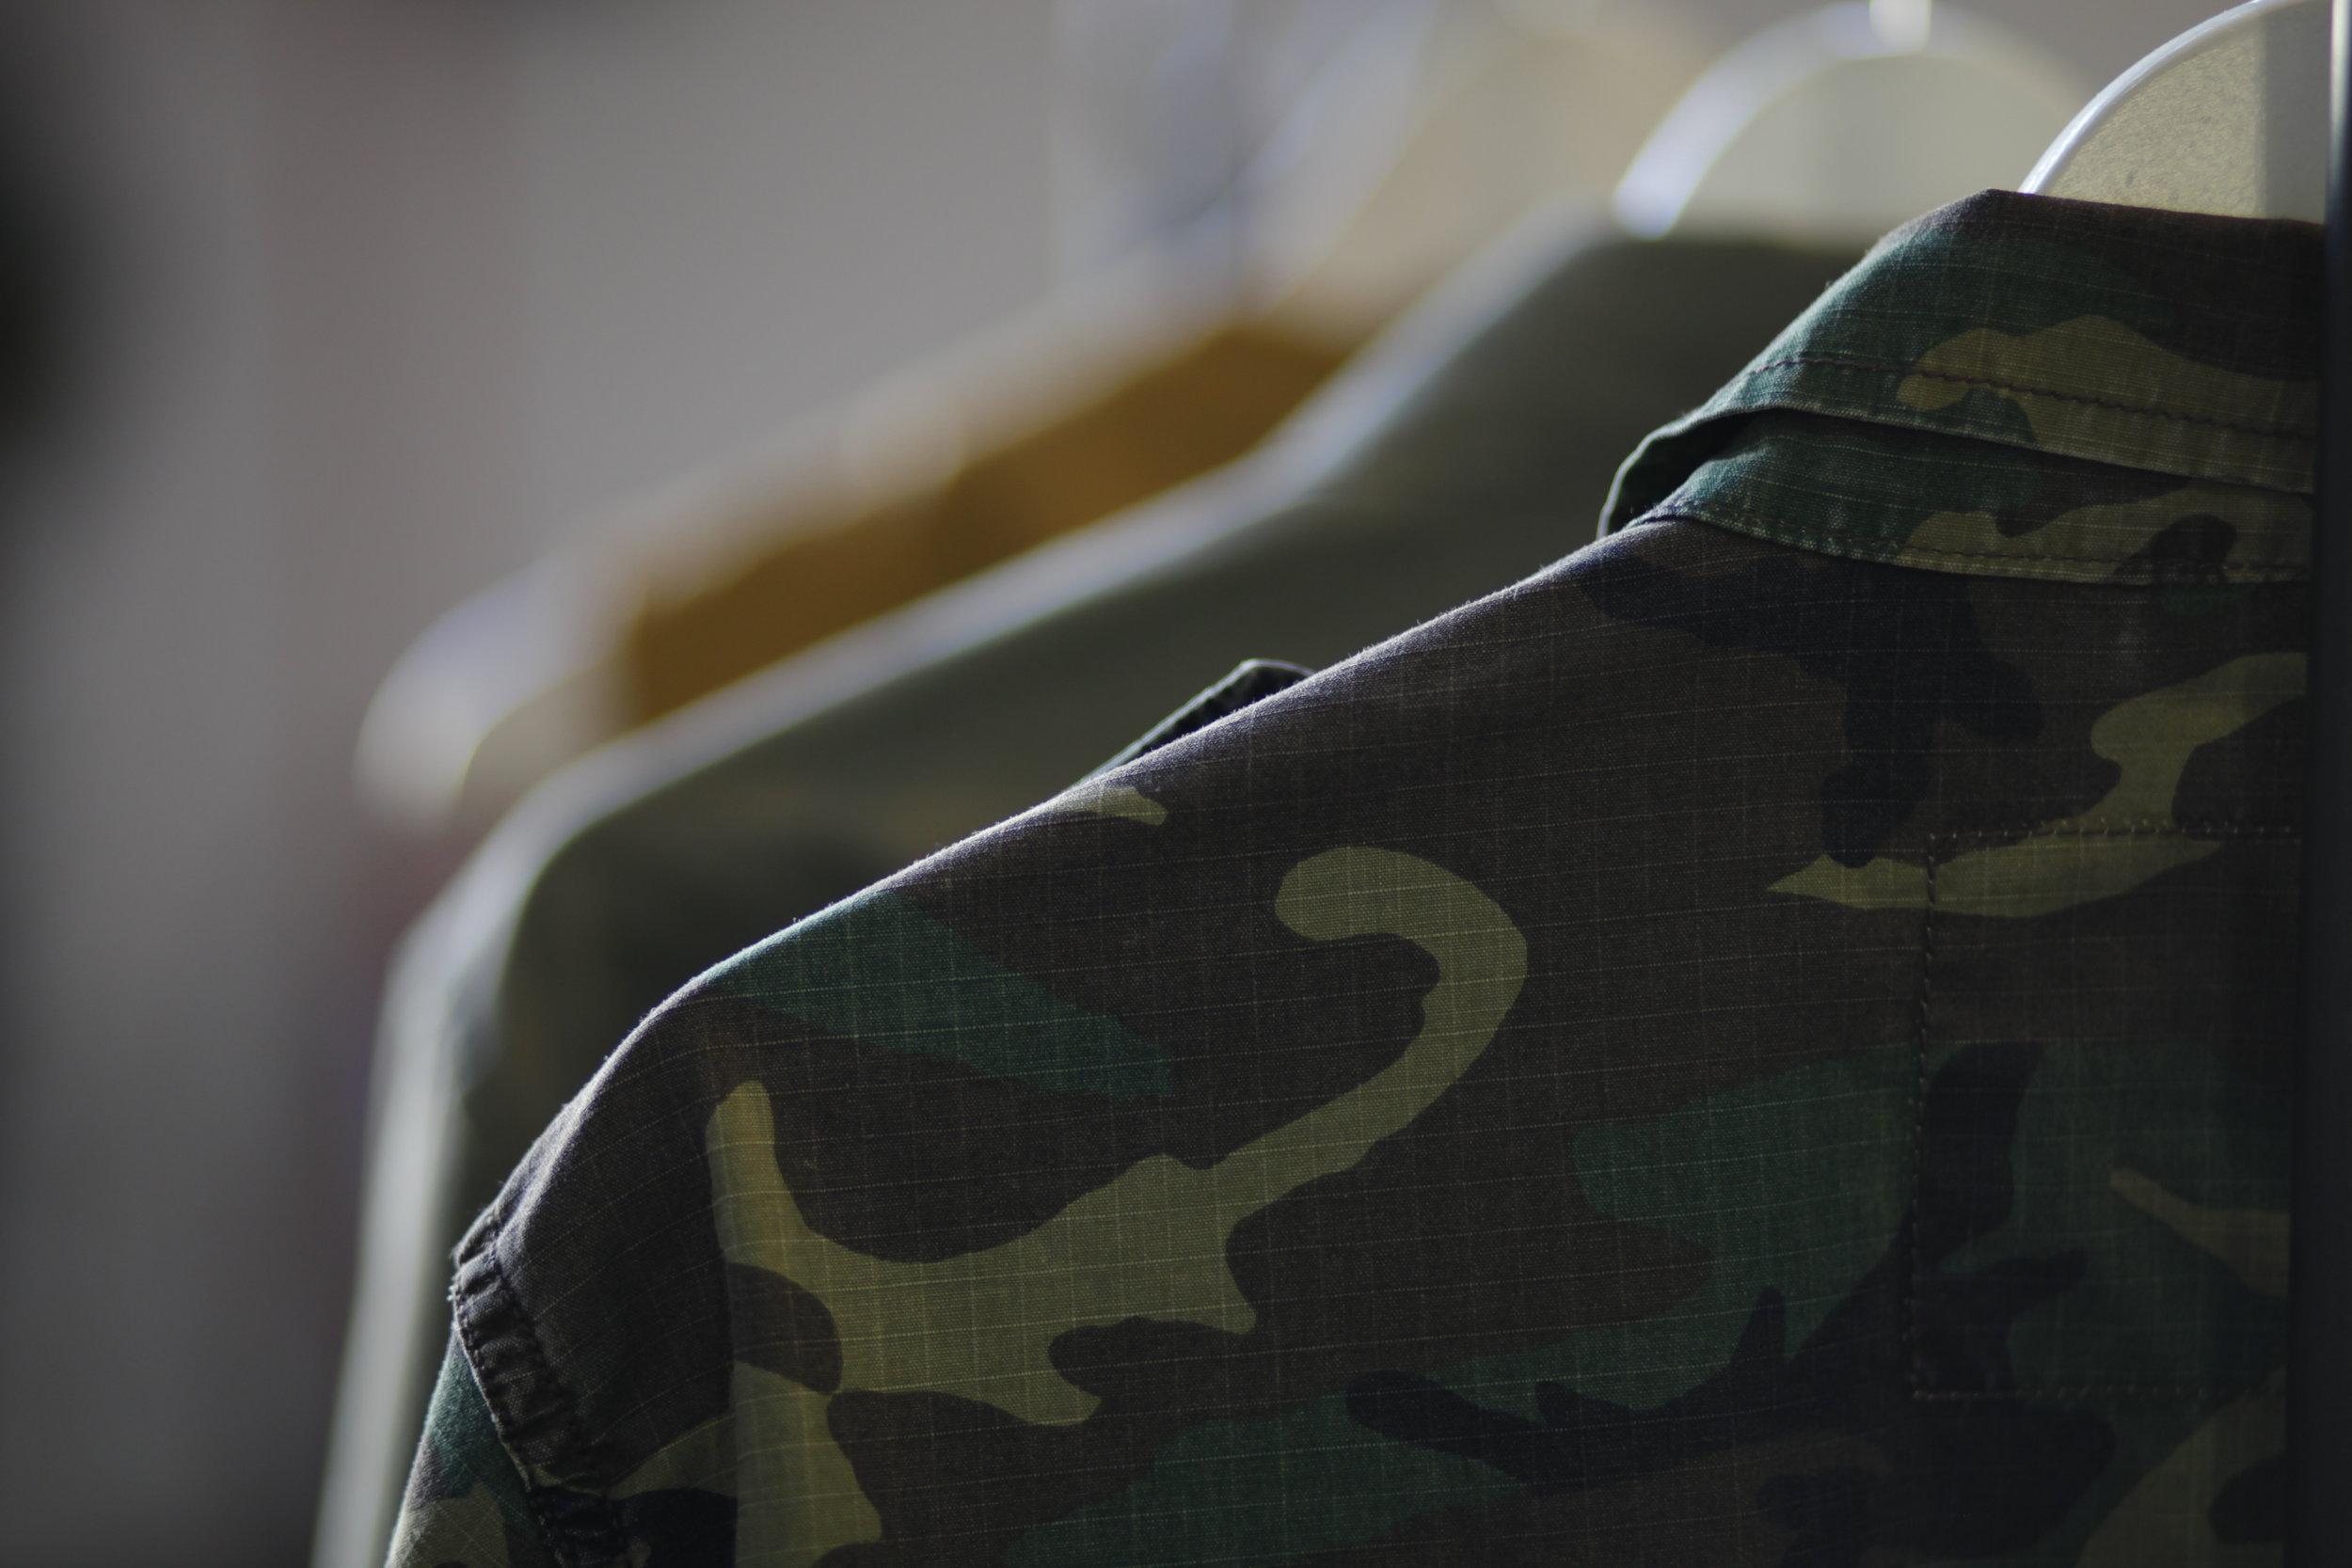 fortela army squarzi milan